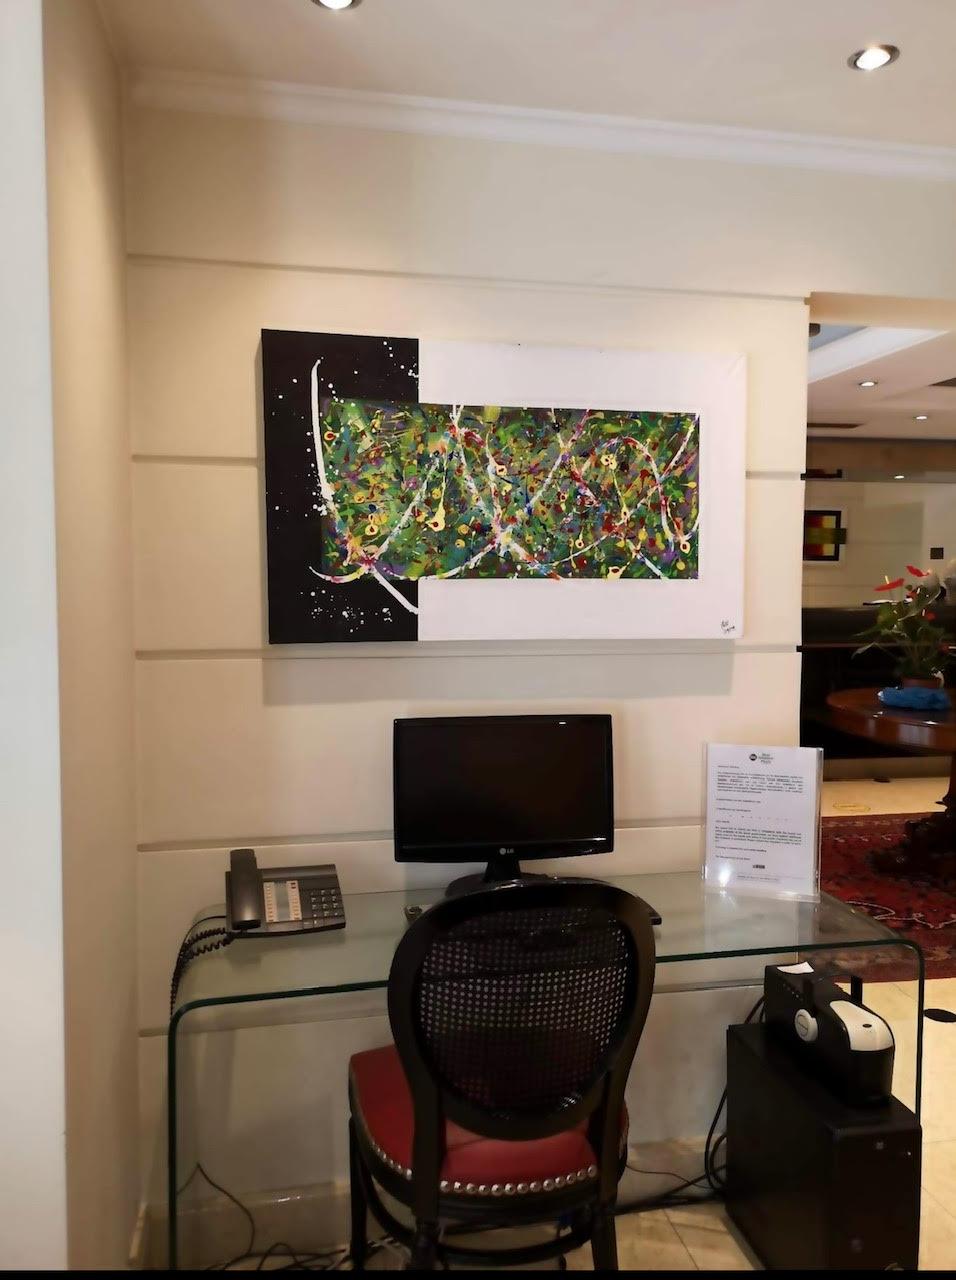 BEST-WESTERN-PLUS-EMBASSY-HOTEL-7